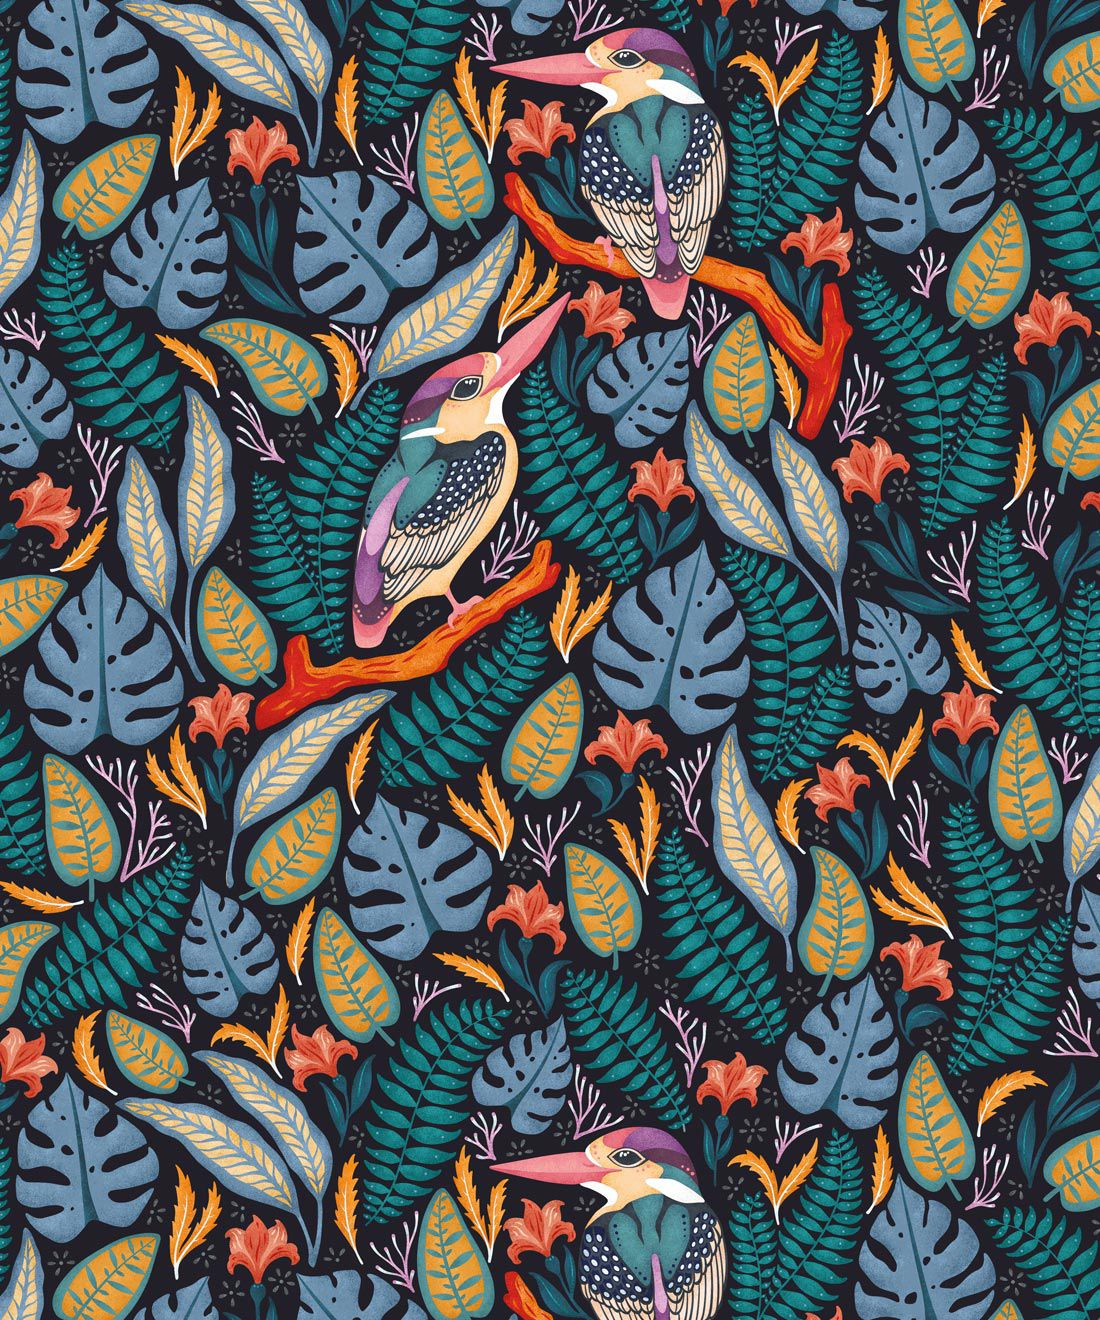 Kingfisher Wallpaper • Bird Wallpaper • Assorted Color